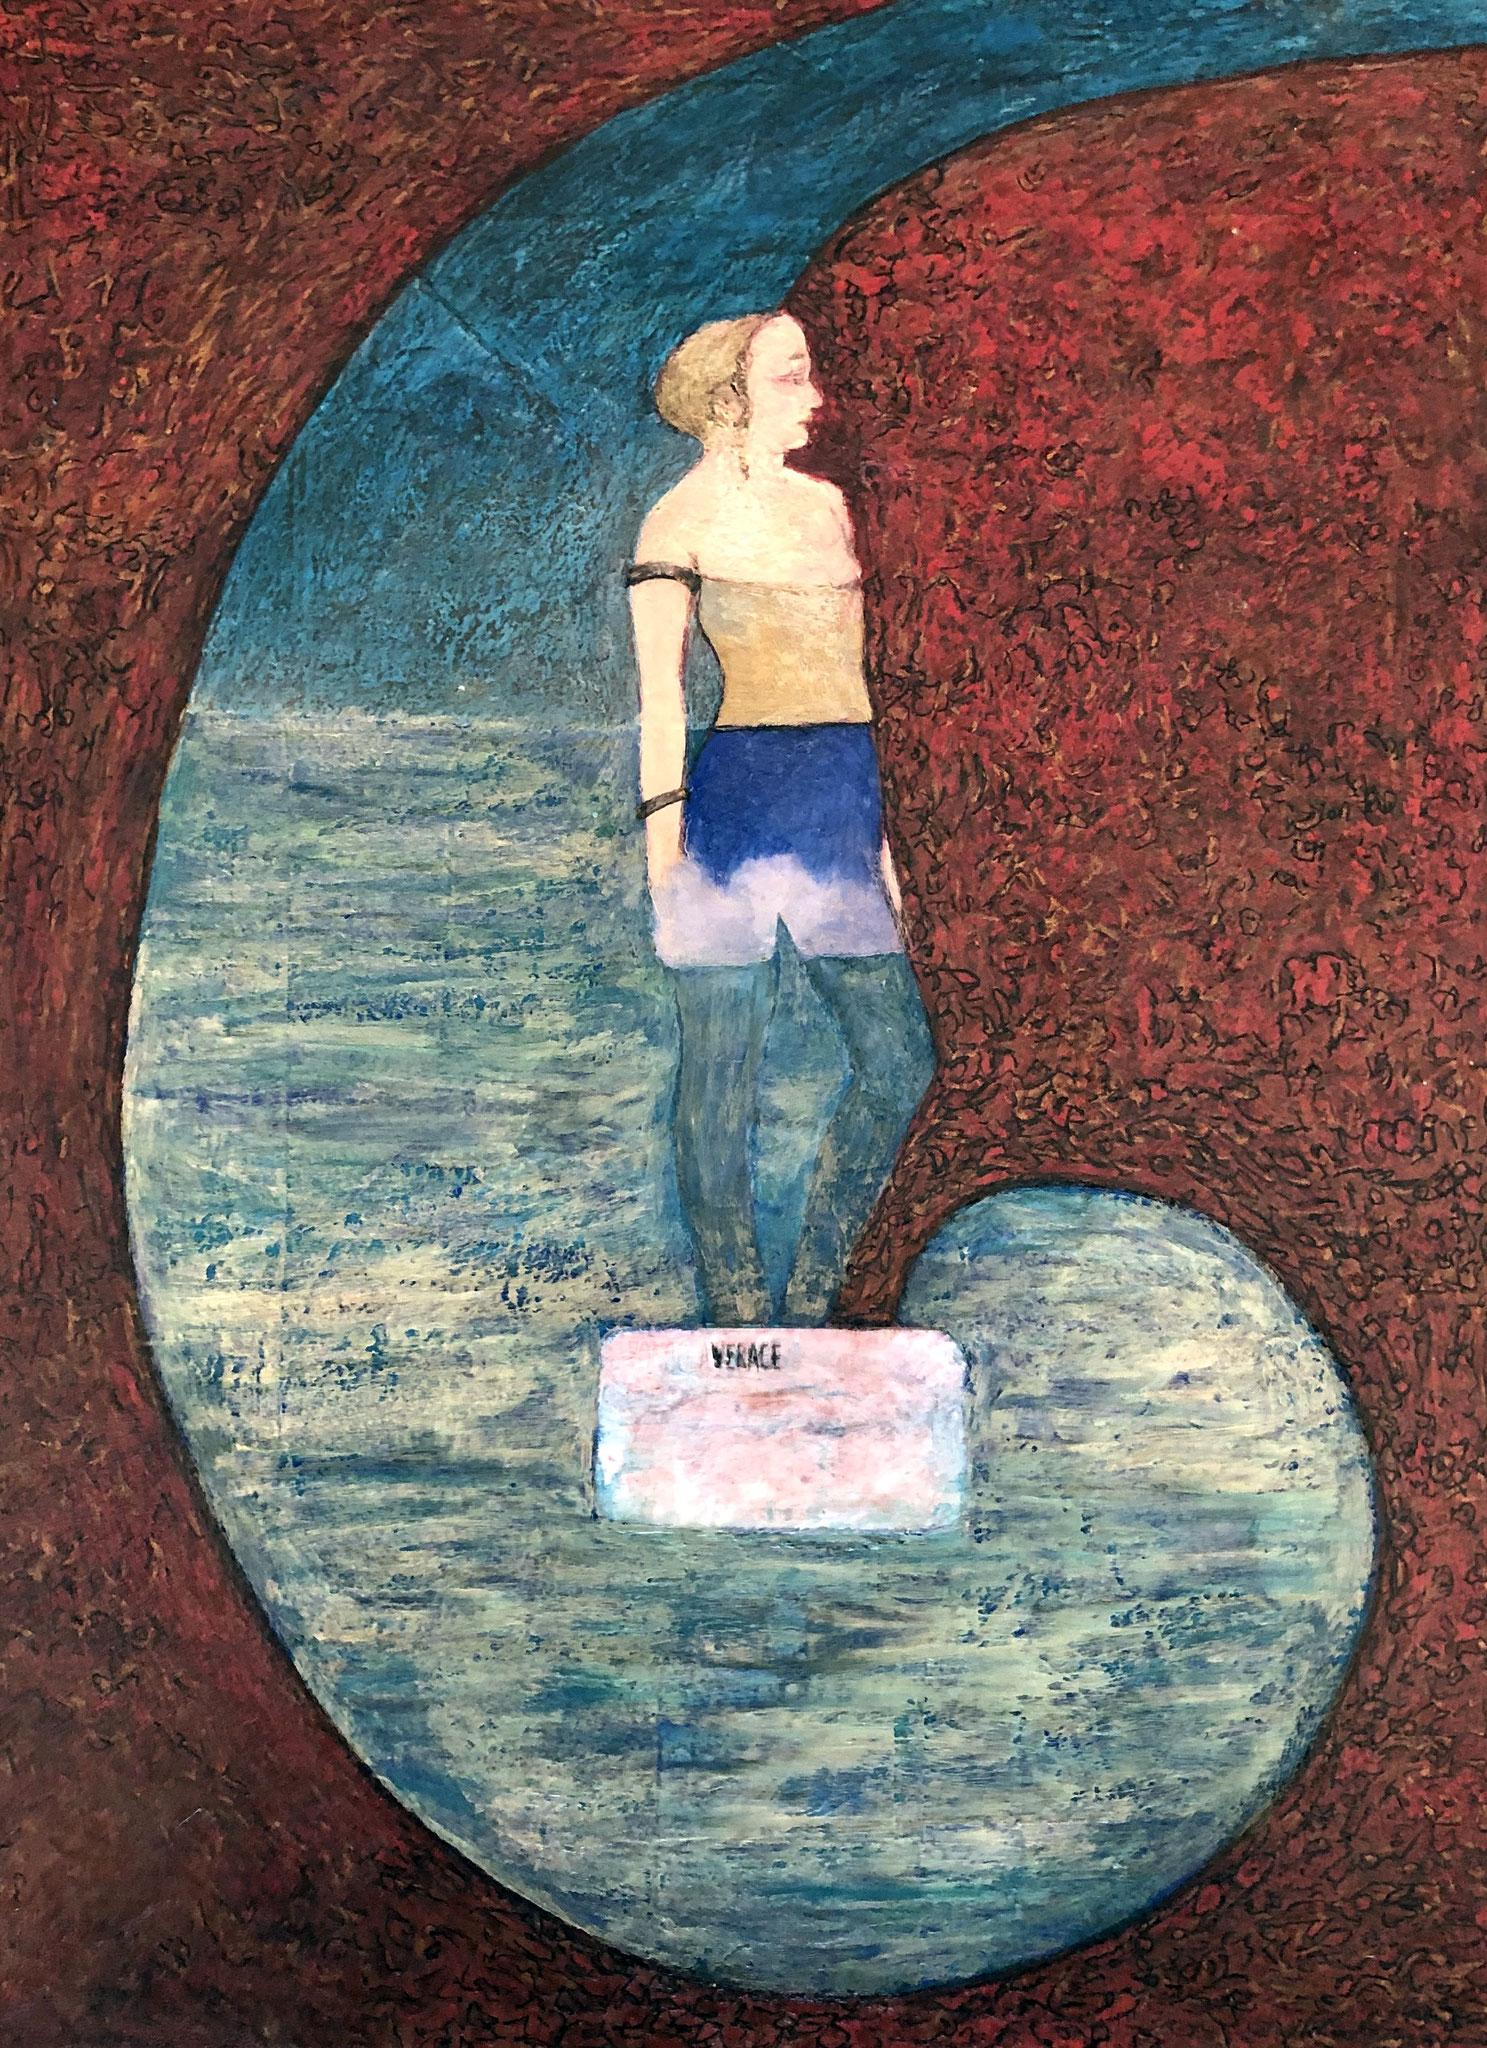 TARANTO/LAMA, VERACE      Acryl auf Papier - 40 x 30 cm